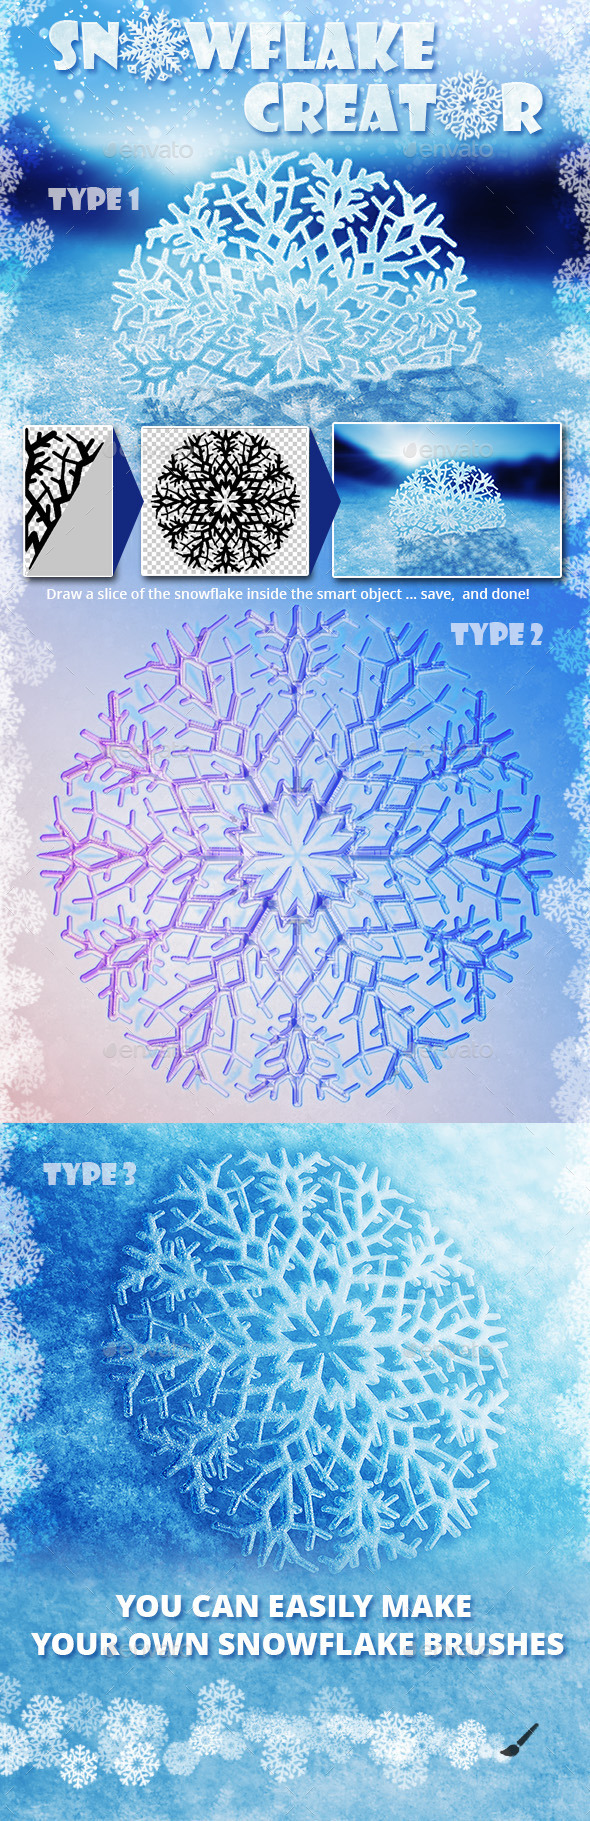 Snowflake Creator - Miscellaneous Print